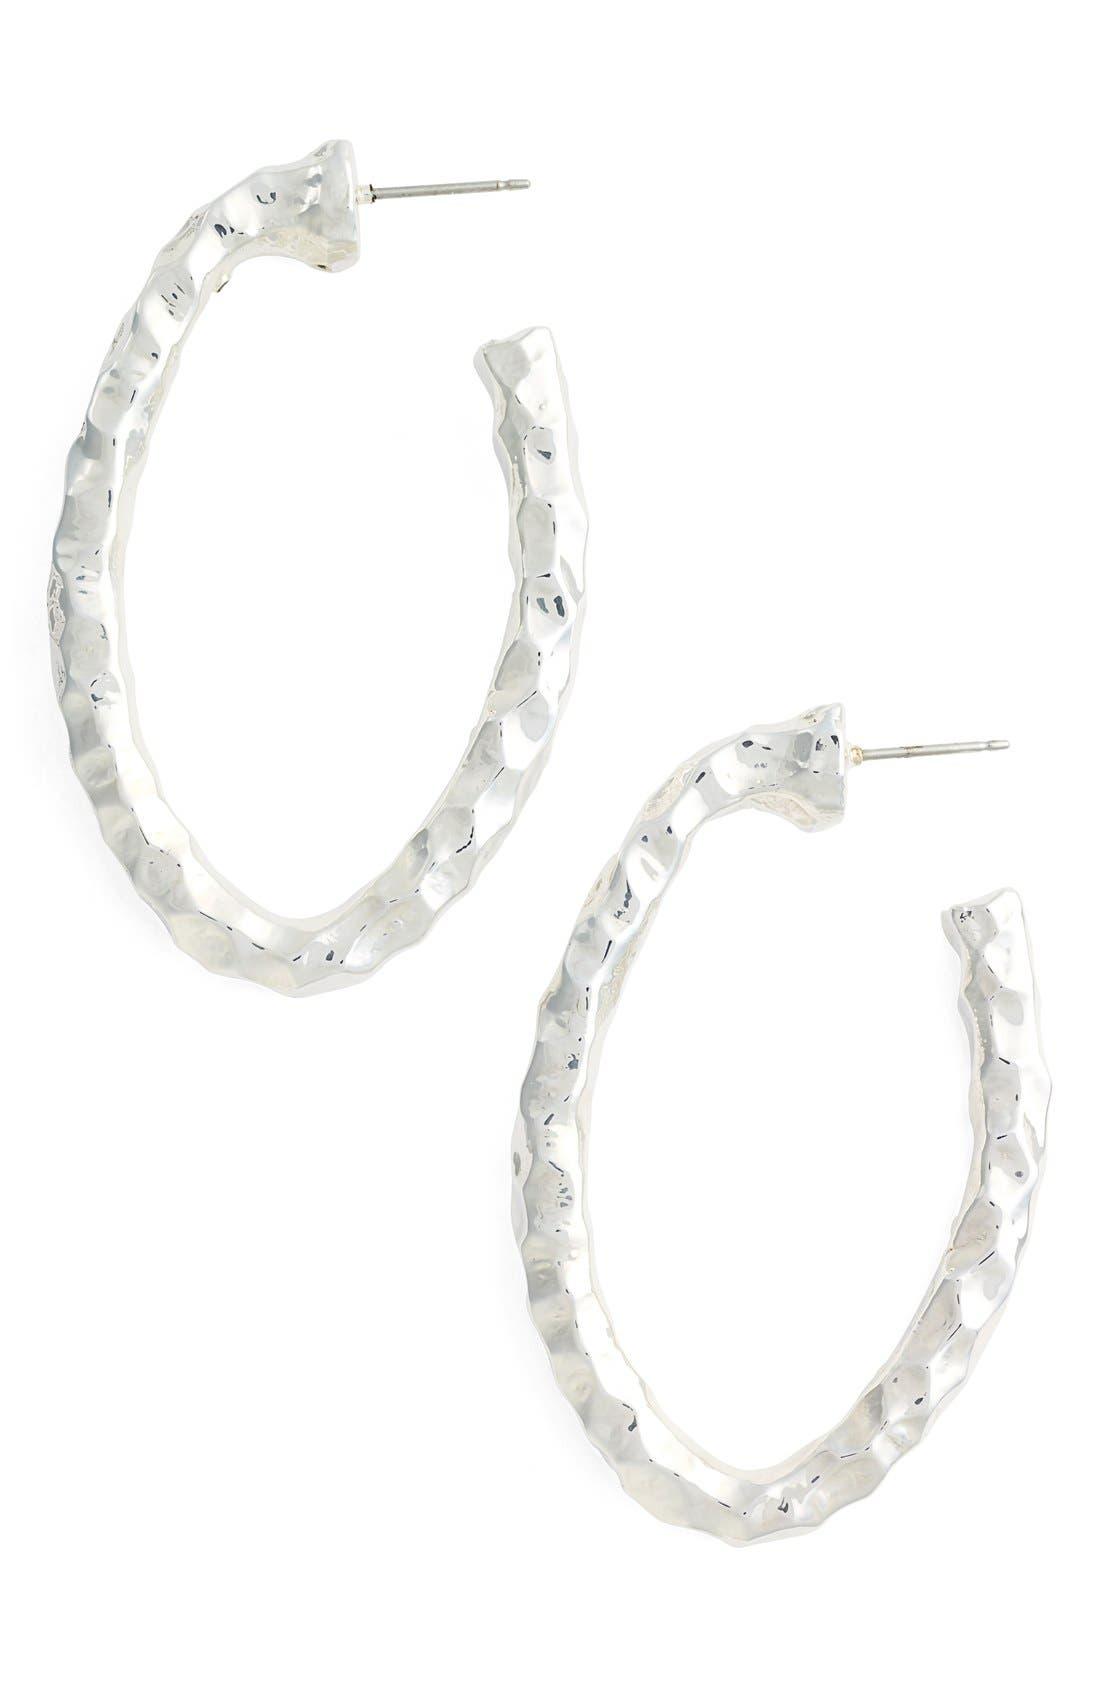 Main Image - Simon Sebbag Hammered Hoop Earrings